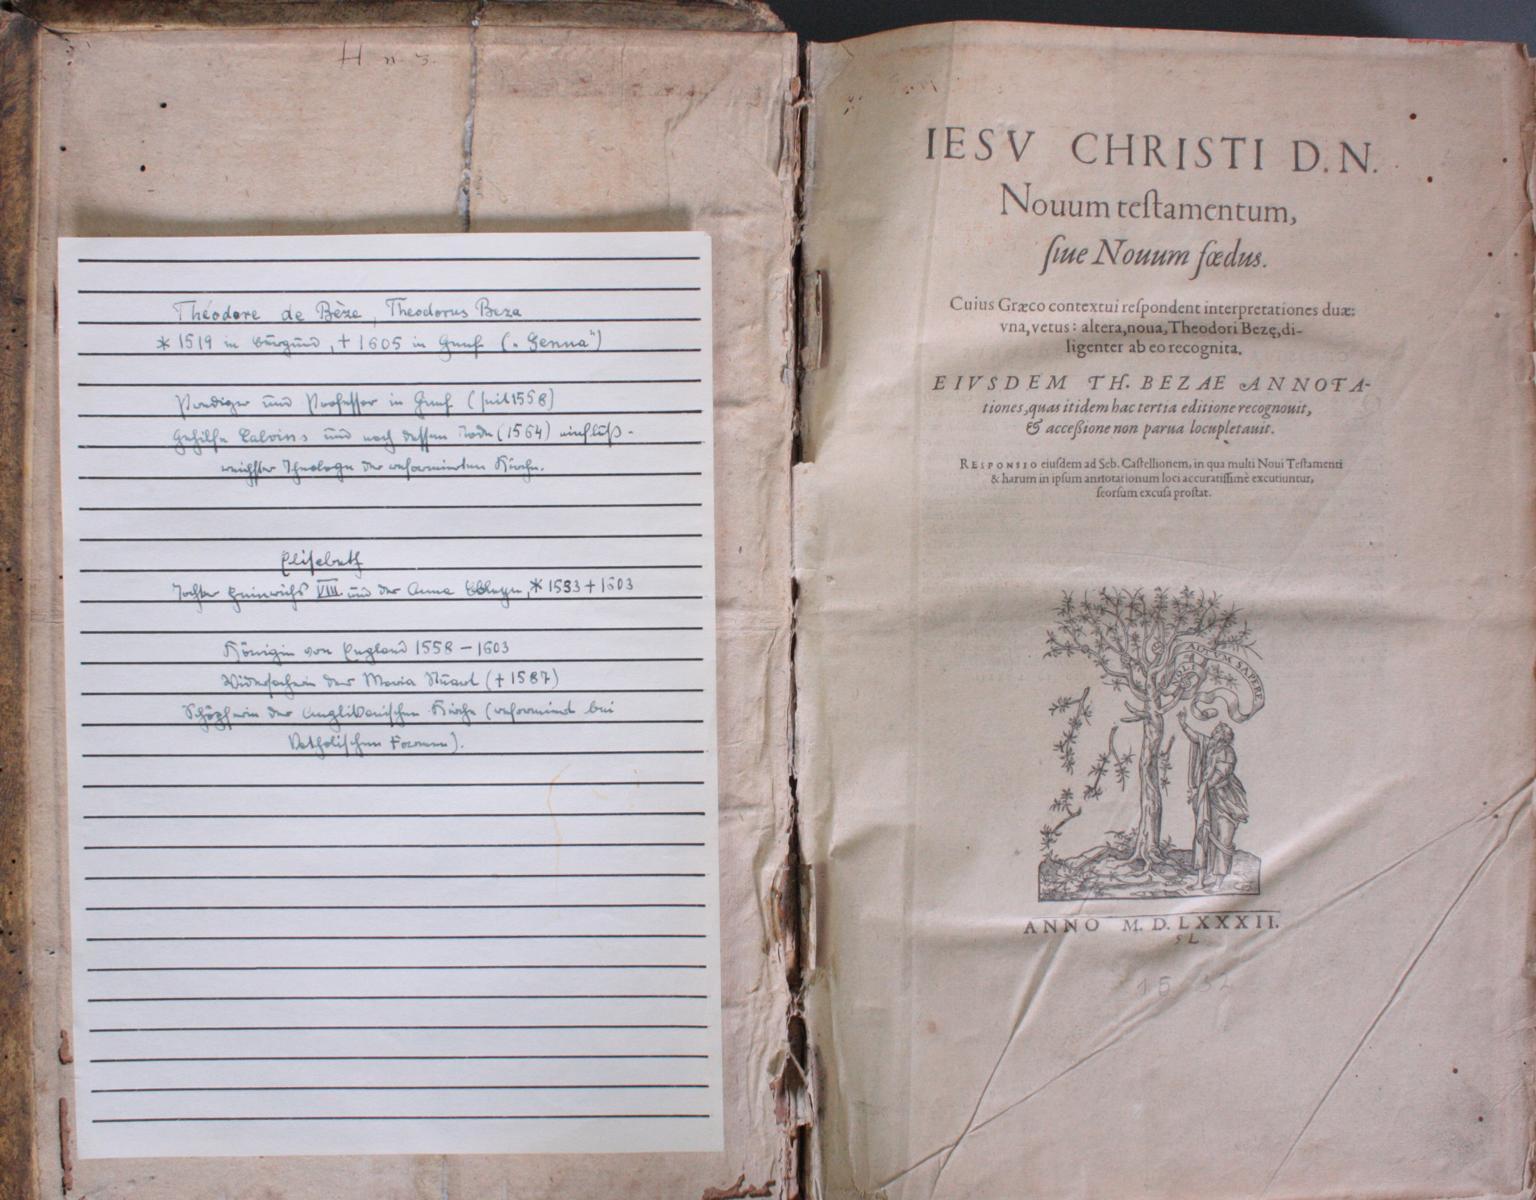 Griechische-Lateinische Bibel, Novum Testamentum 1582-2